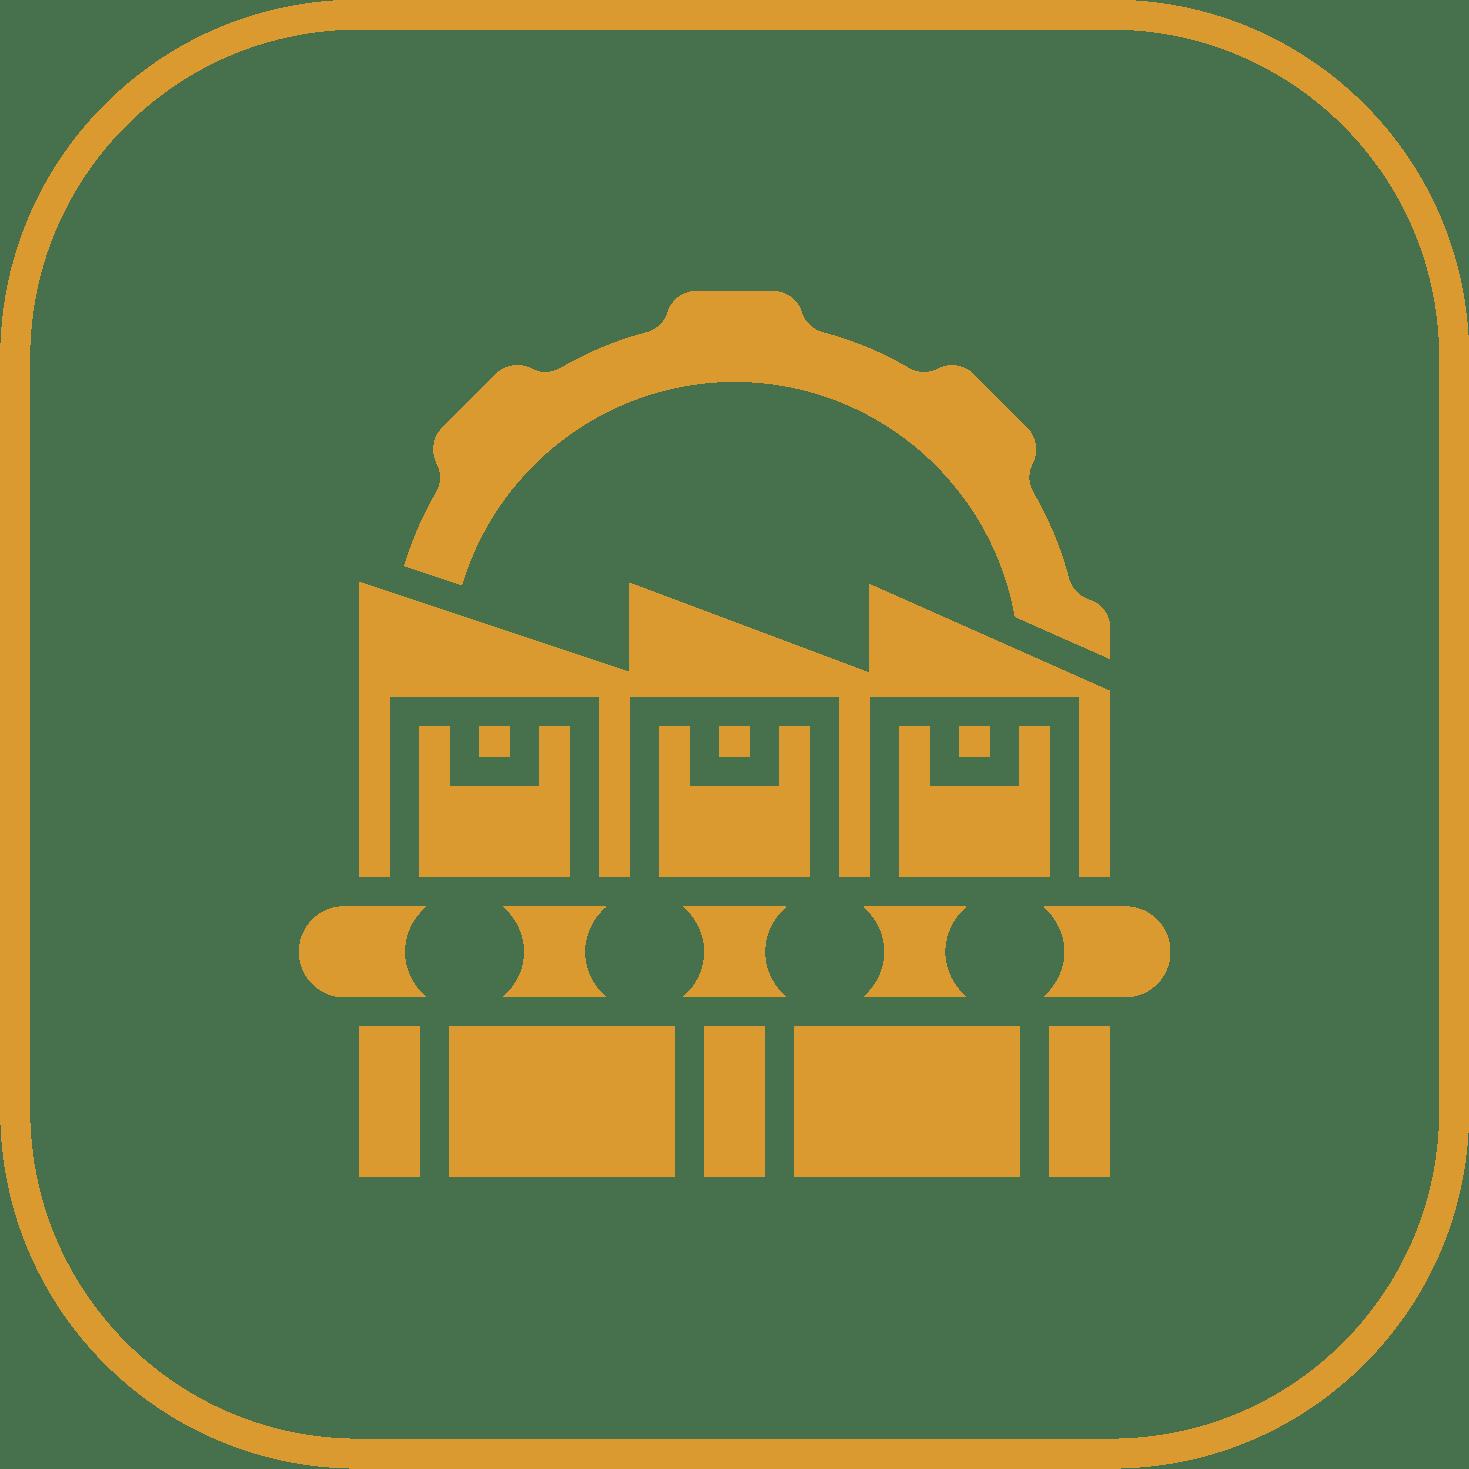 Pesona Remboelan Serpong - Rumah 2 Lantai Cukup DP 34 Juta Langsung Akad 14